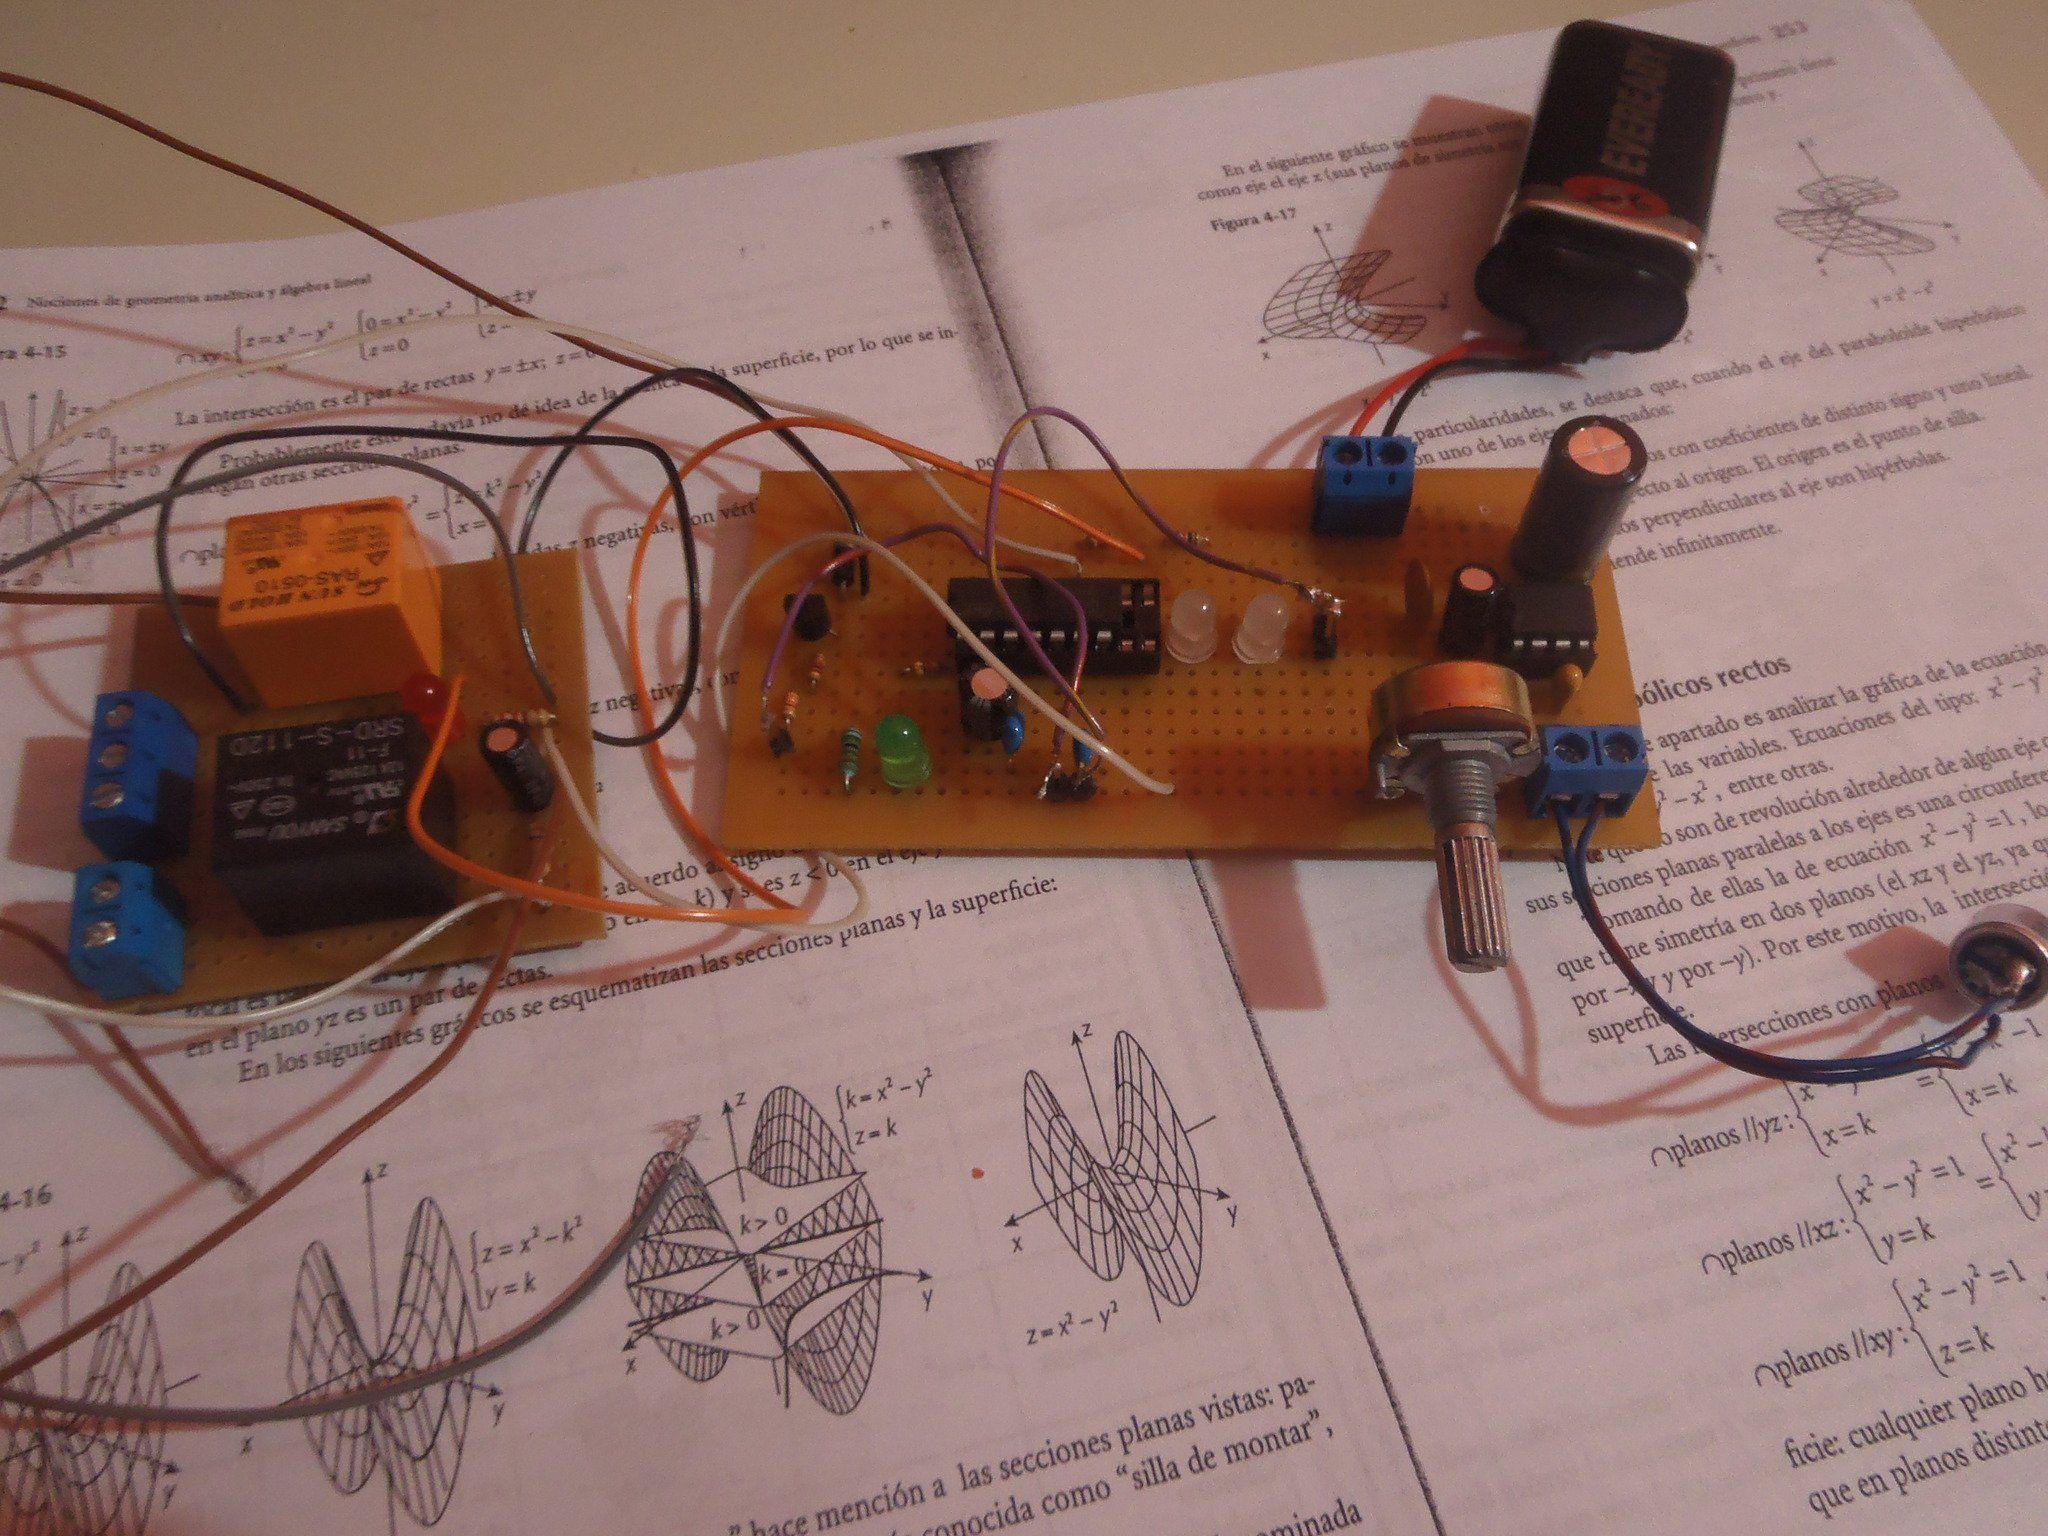 Prende Y Apaga La Luz De Tu Pieza Con Un Aplauso Km Fm Transmitter Electronic Circuits And Diagramelectronics Hazlo Mismo